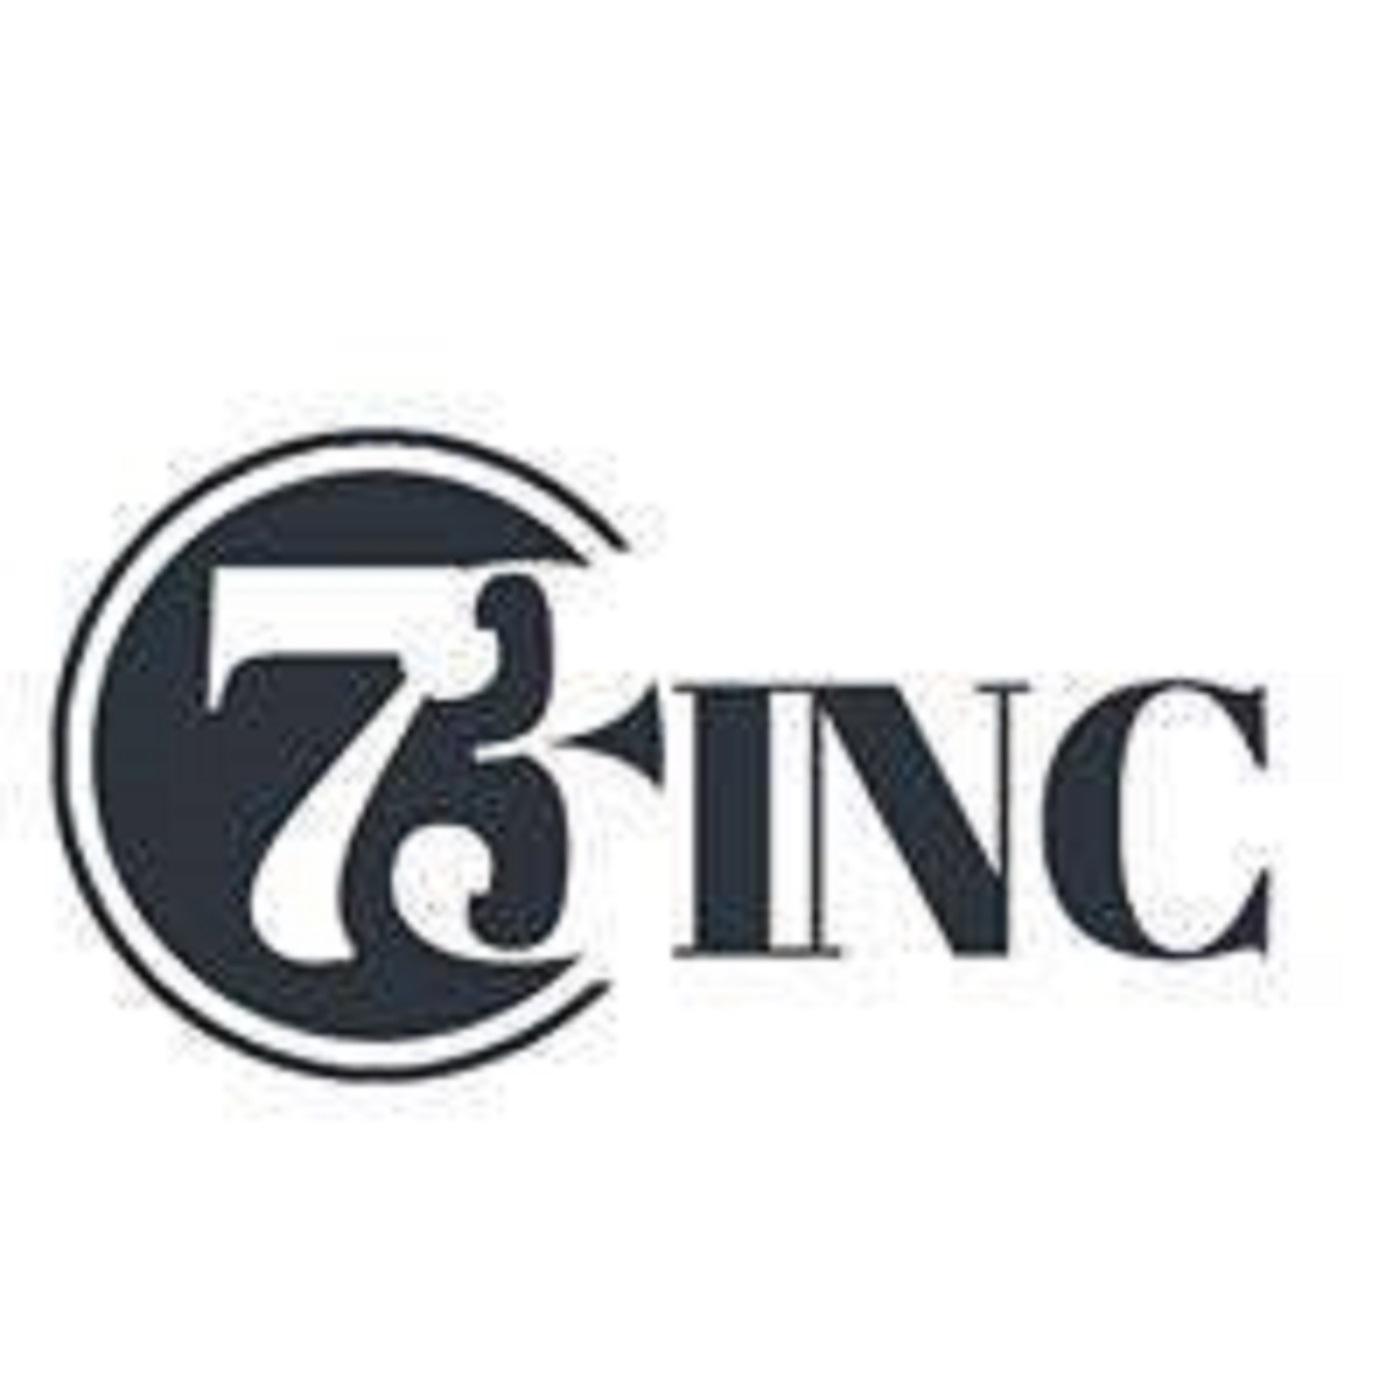 73inc (@73incwebmaster) Cover Image